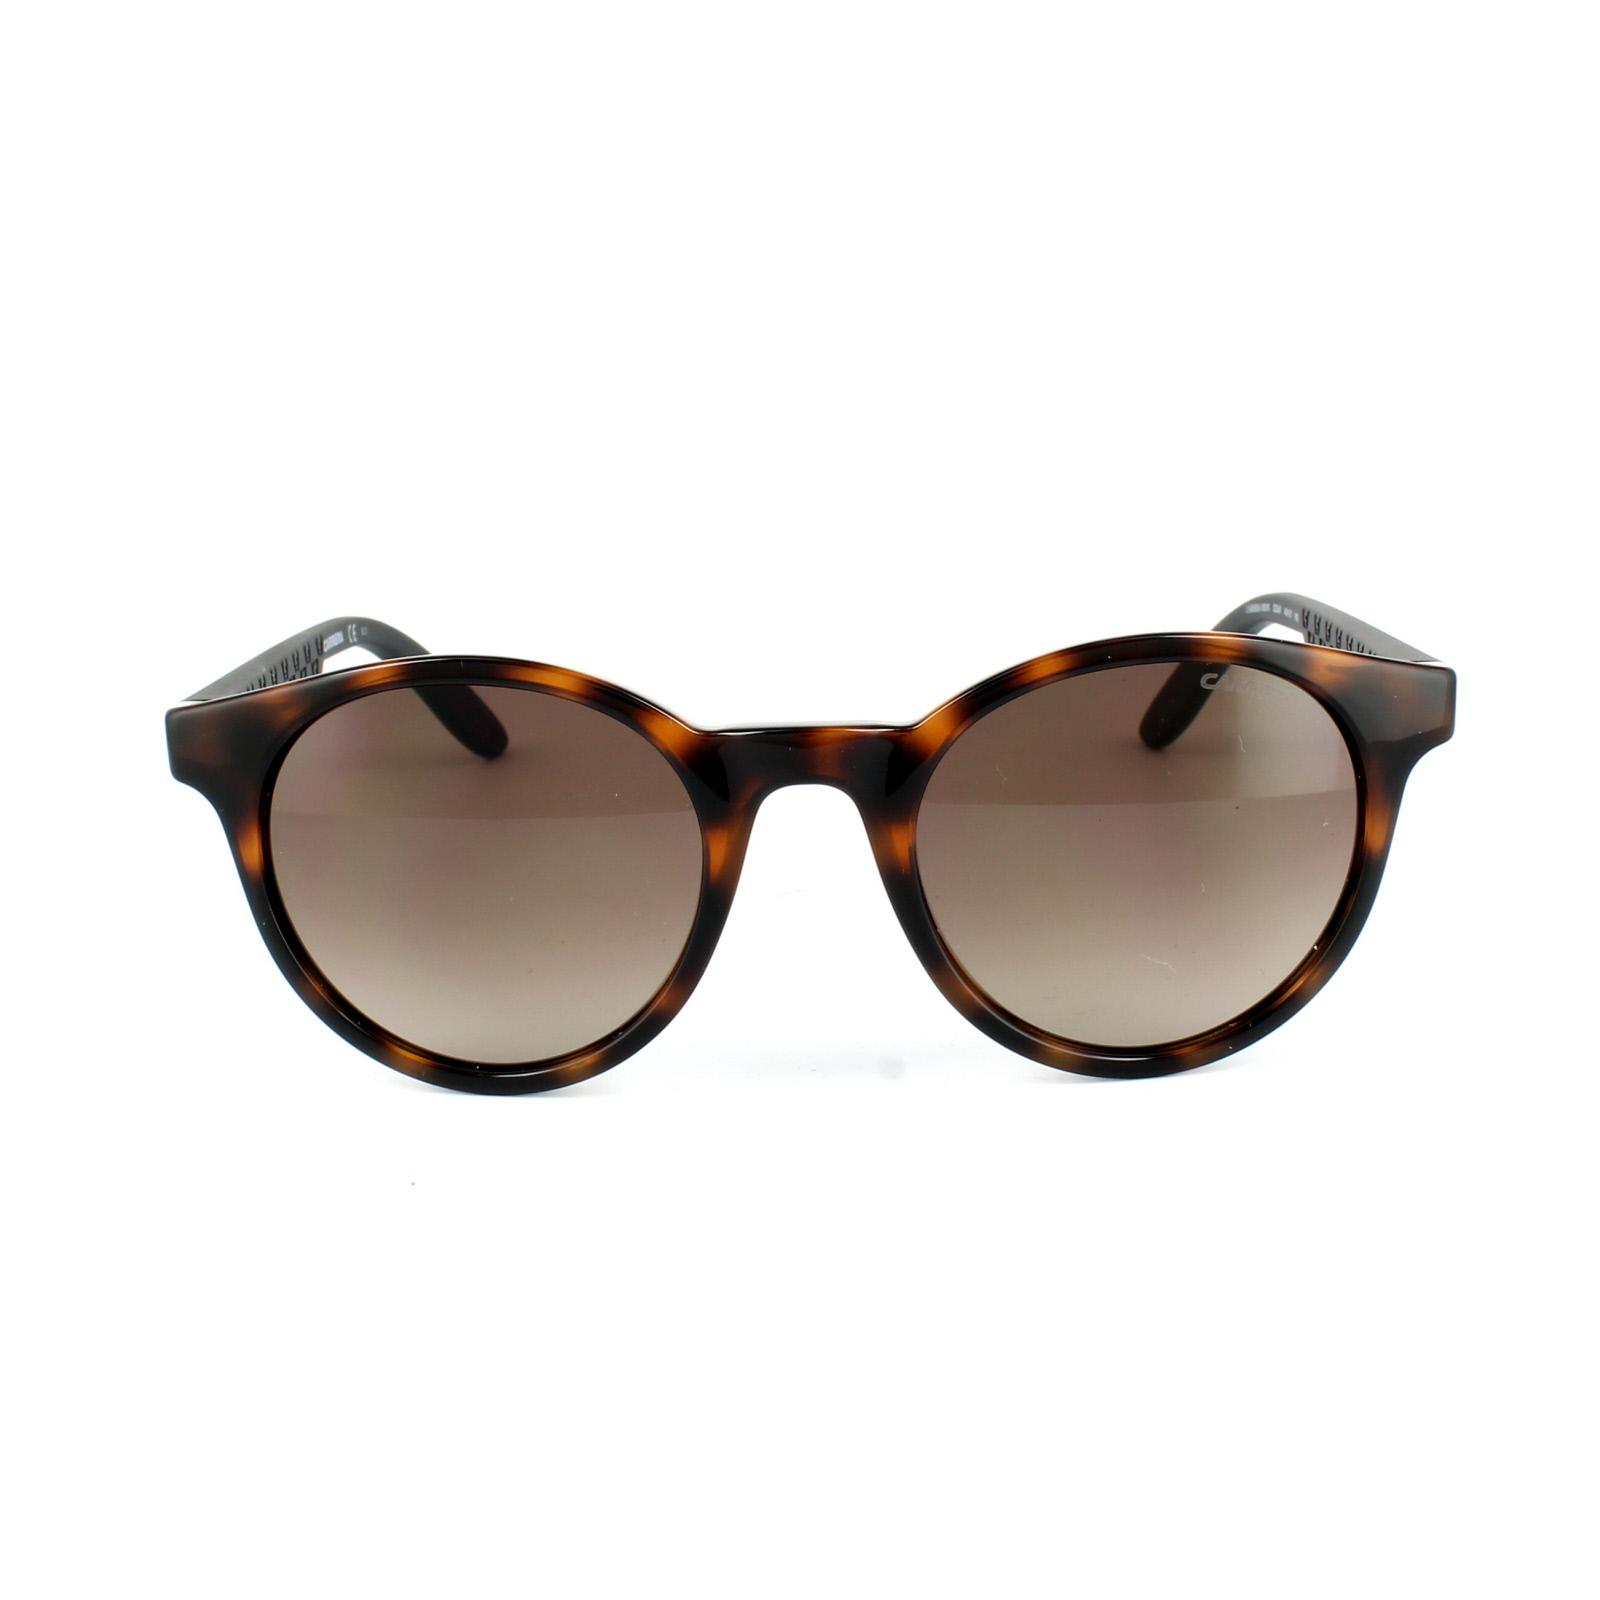 Cheap Carrera Carrera 5029 Sunglasses Discounted Sunglasses